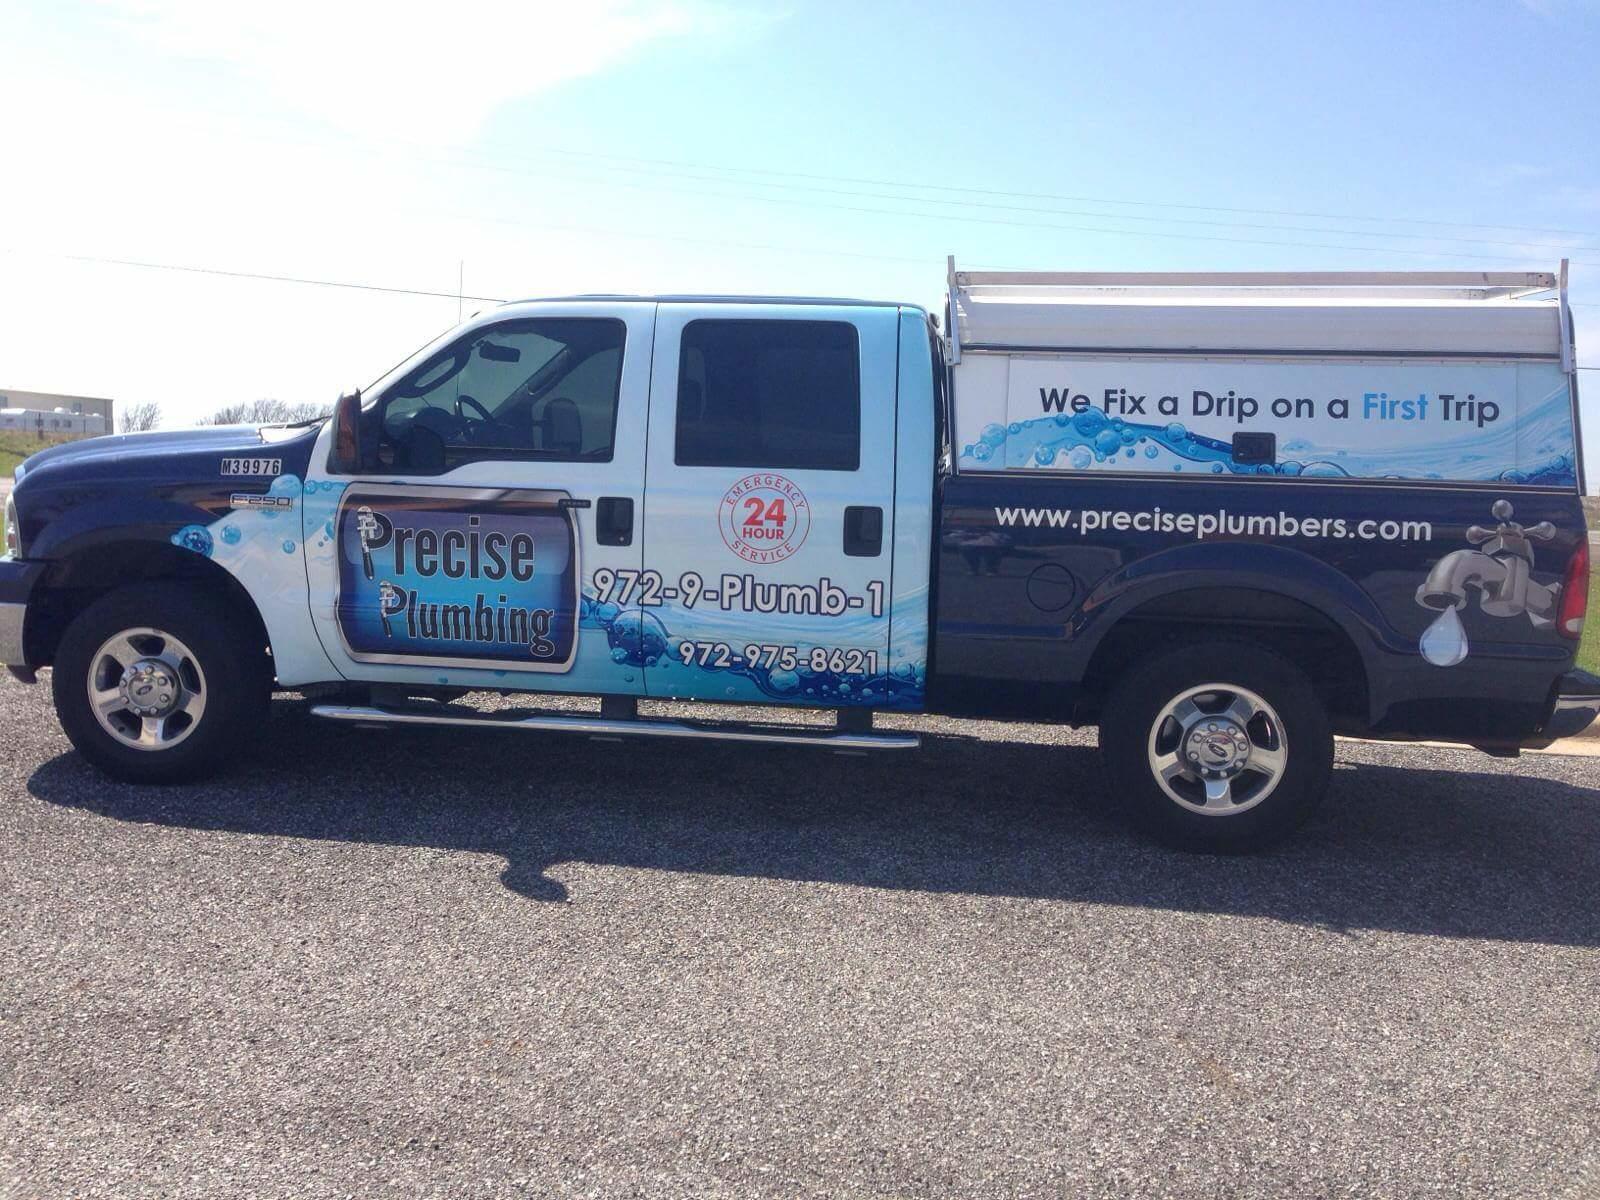 North Texas Precise Plumbing, LLC image 8